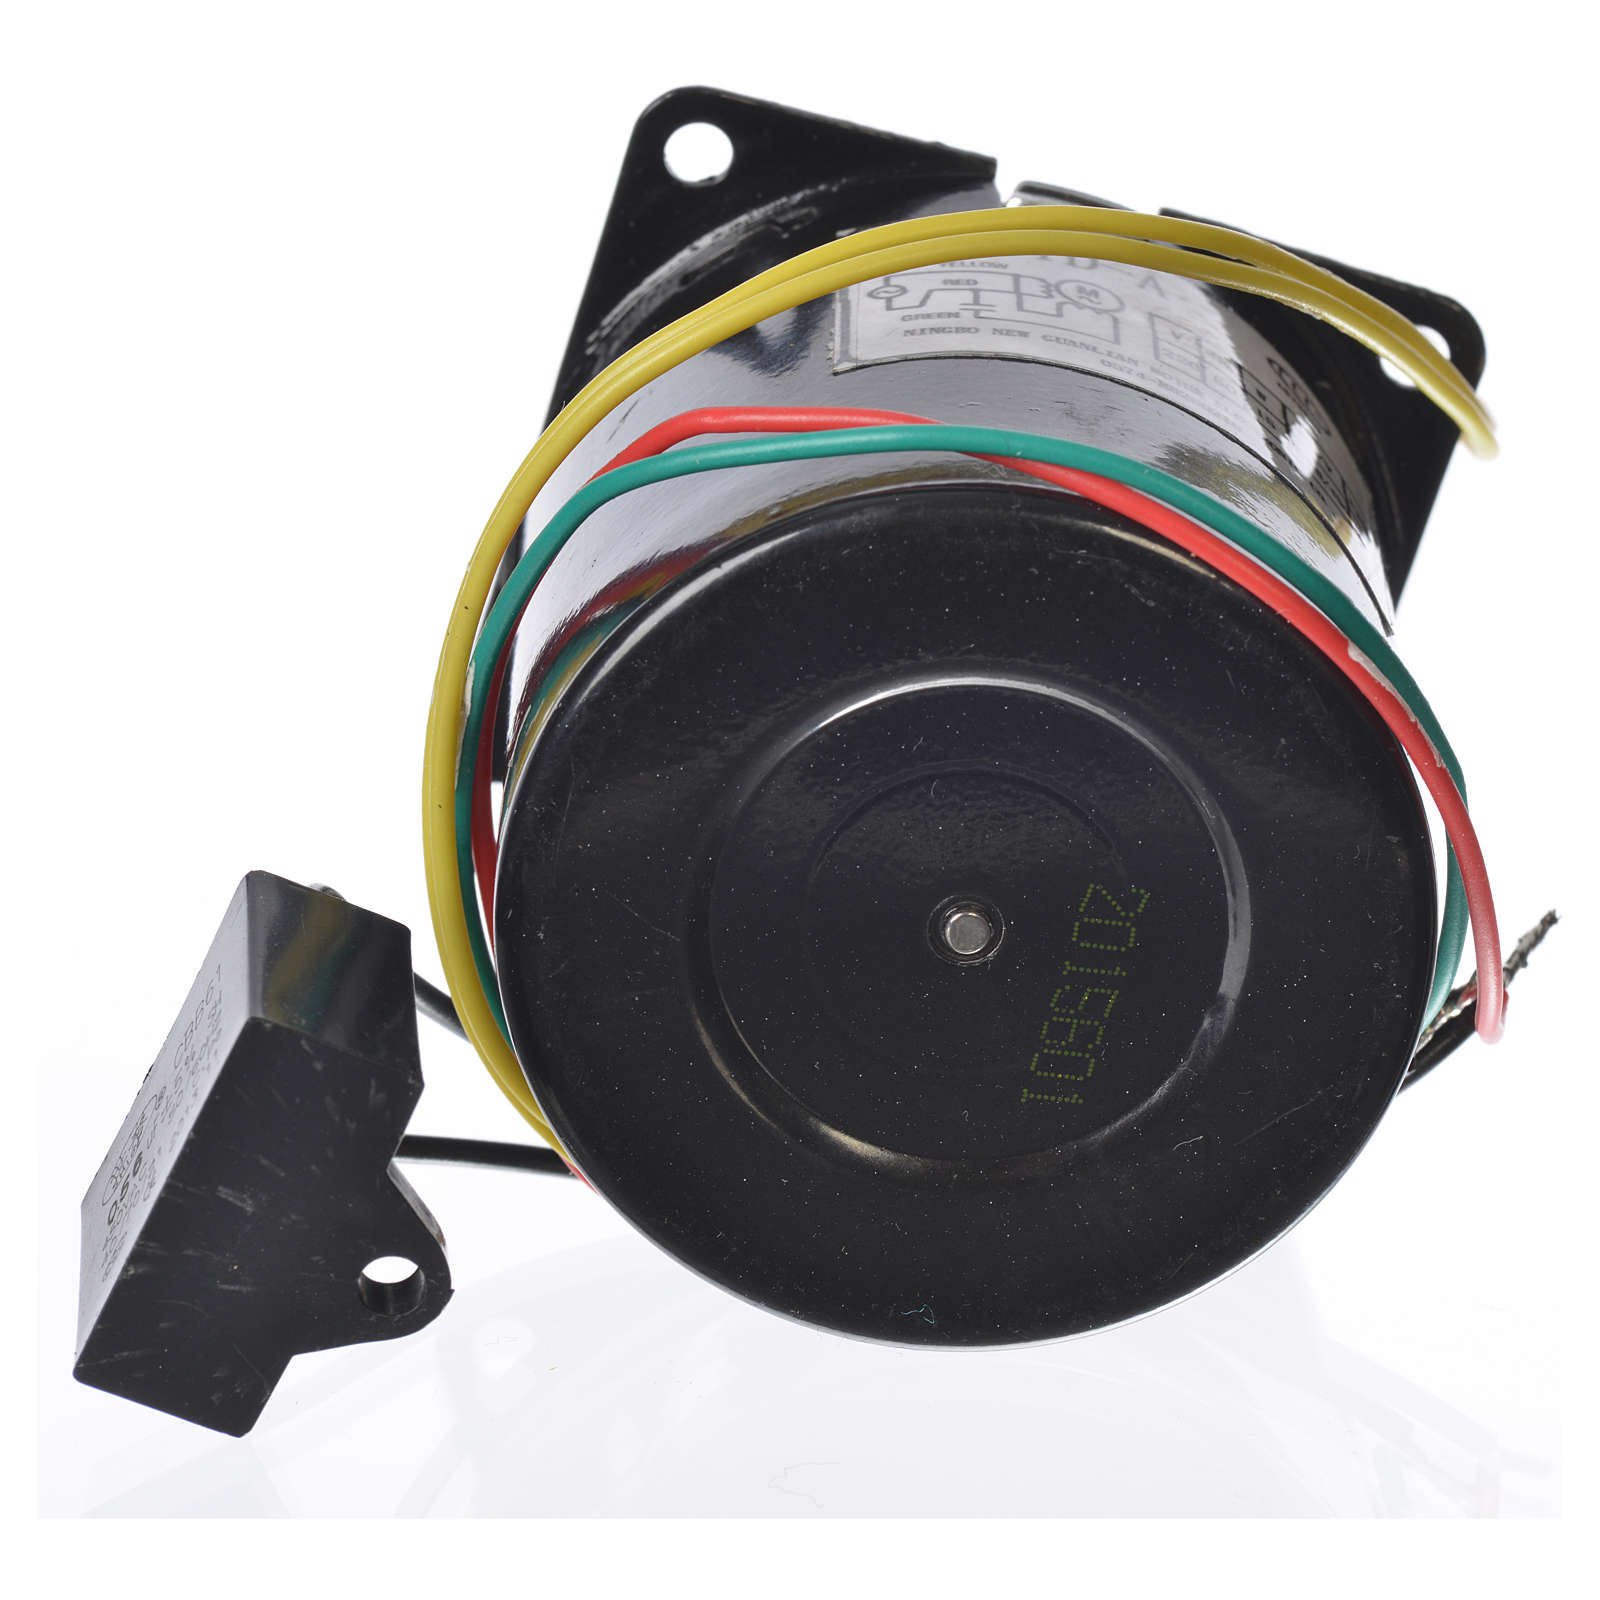 Motoriduttore MPW 10 giri/min presepe 4